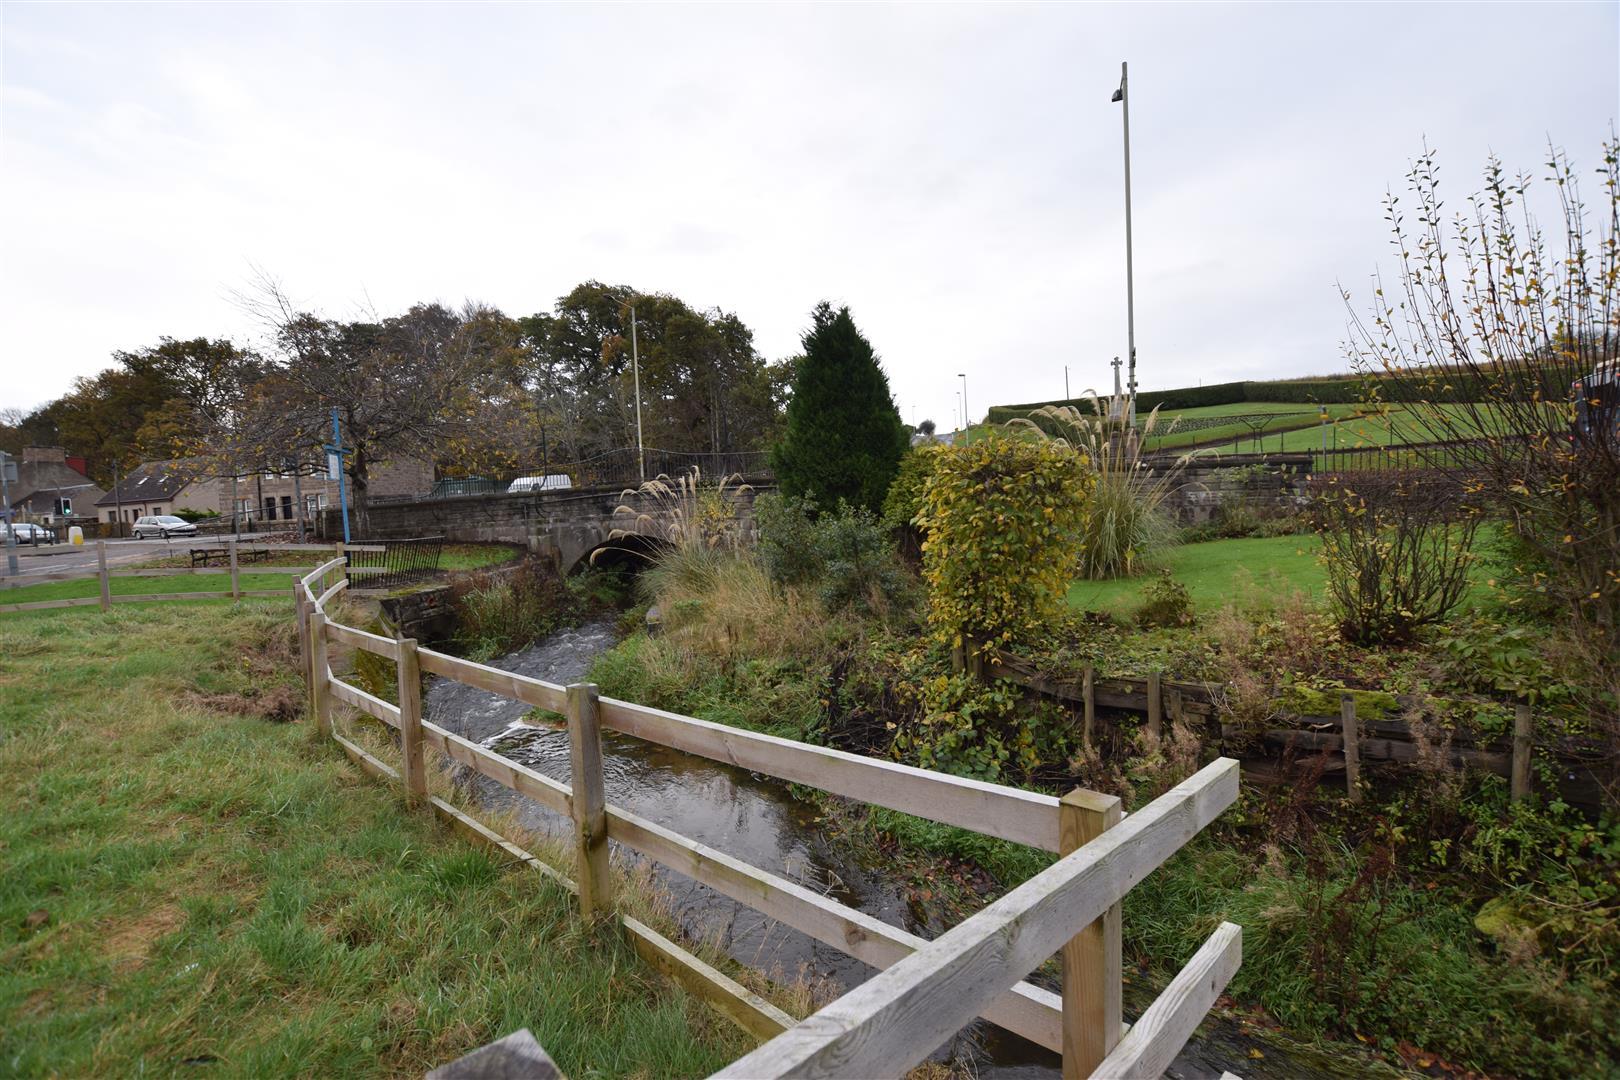 10A, Burnside, Scone, Perthshire, PH2 6LP, UK